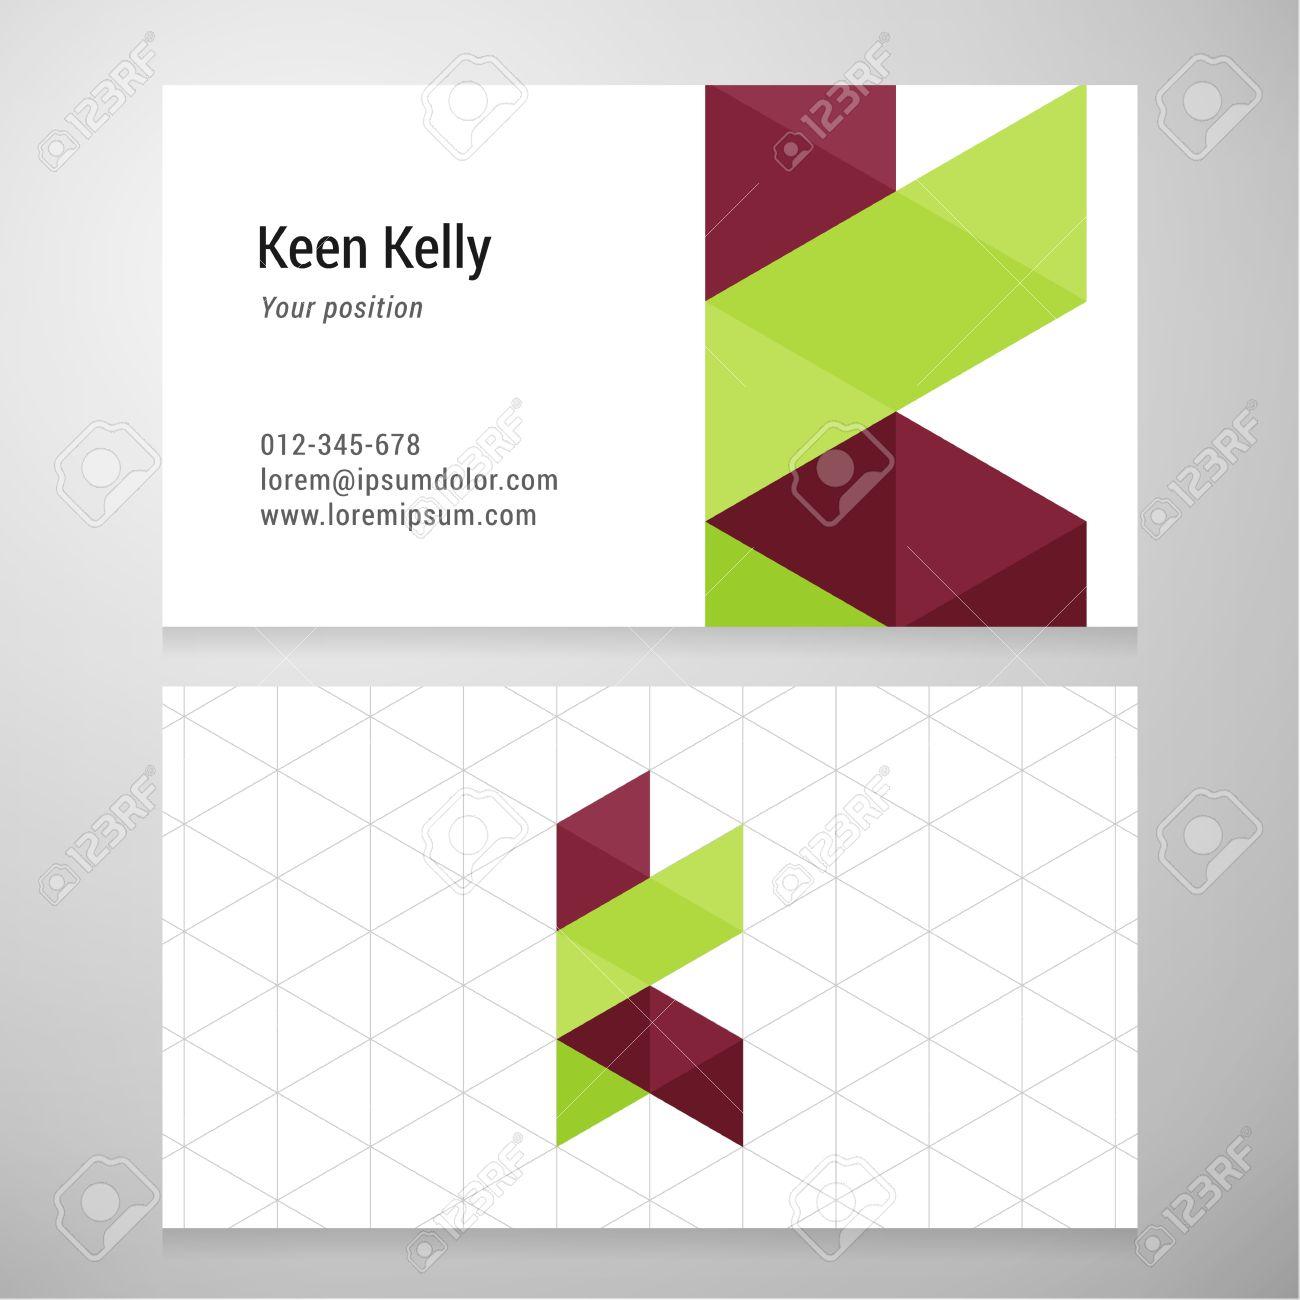 Modern Letter K Origami Business Card Template. Vector Design ...